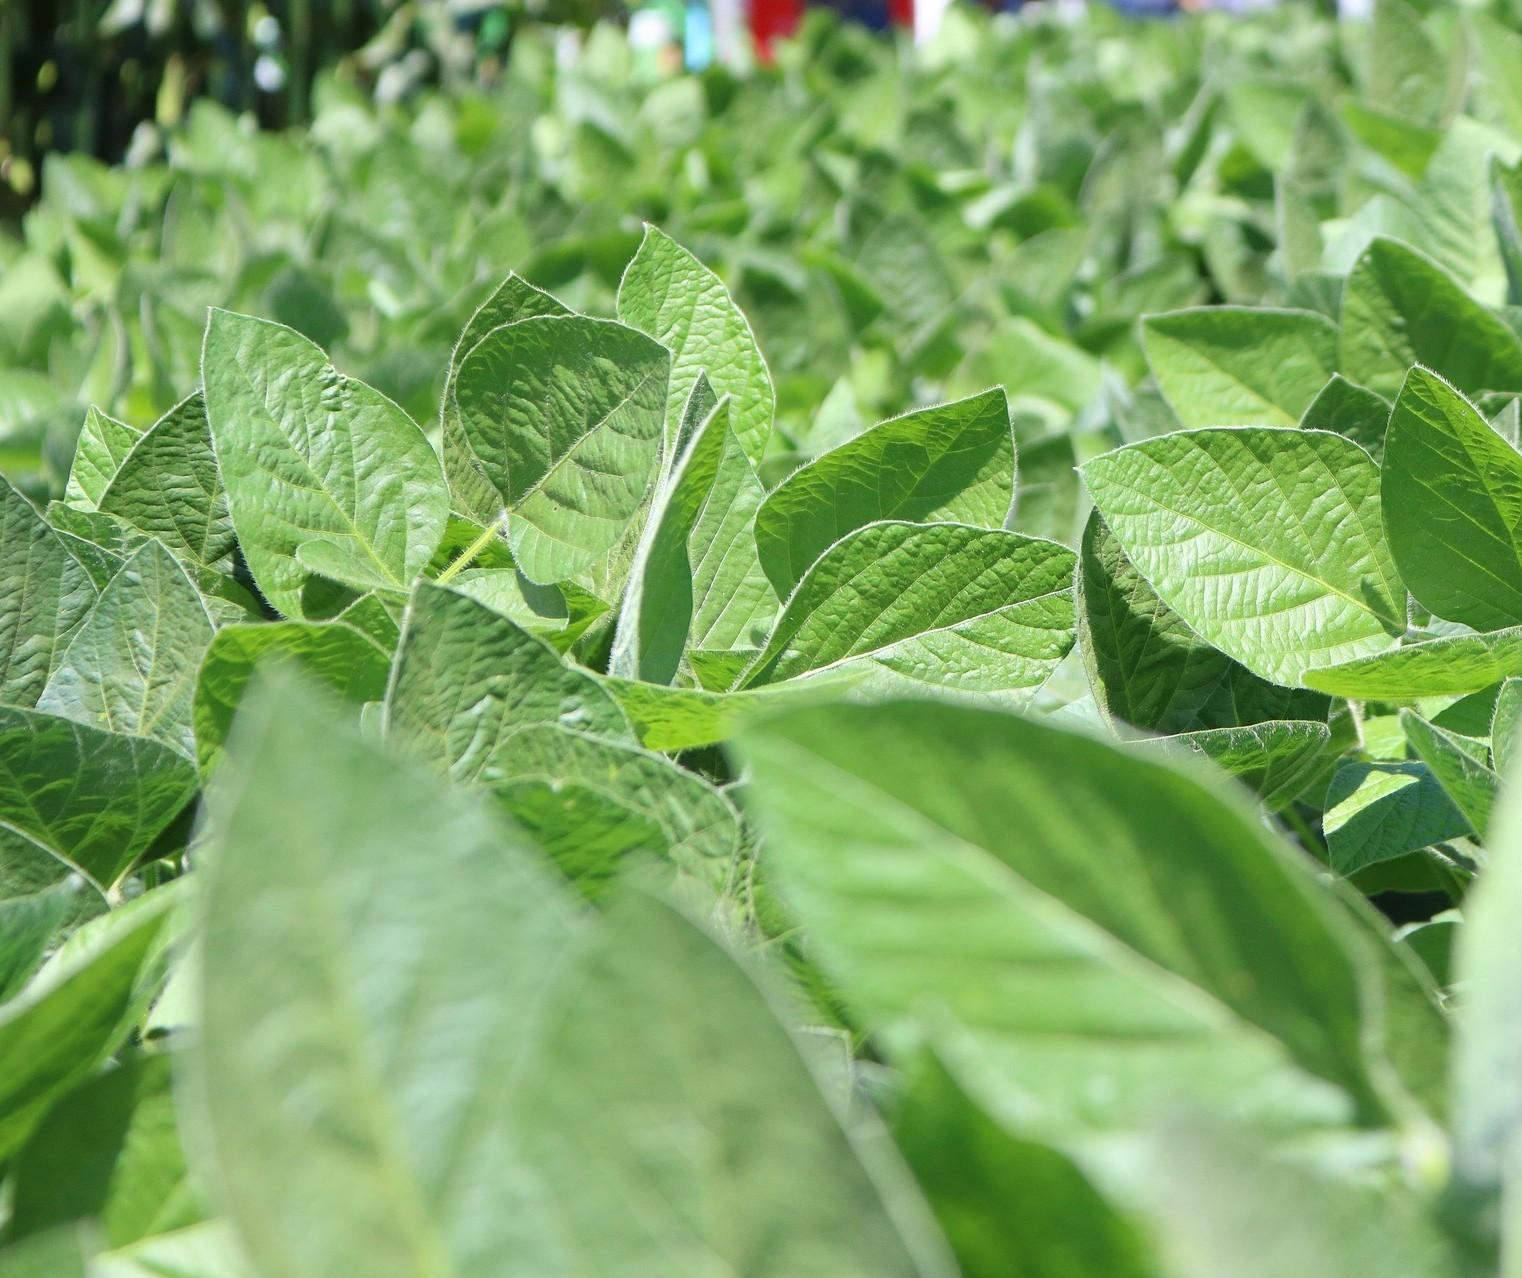 INTL FCStone estima consumo atenuado de fertilizantes em 2020 de 36,6 mi toneladas